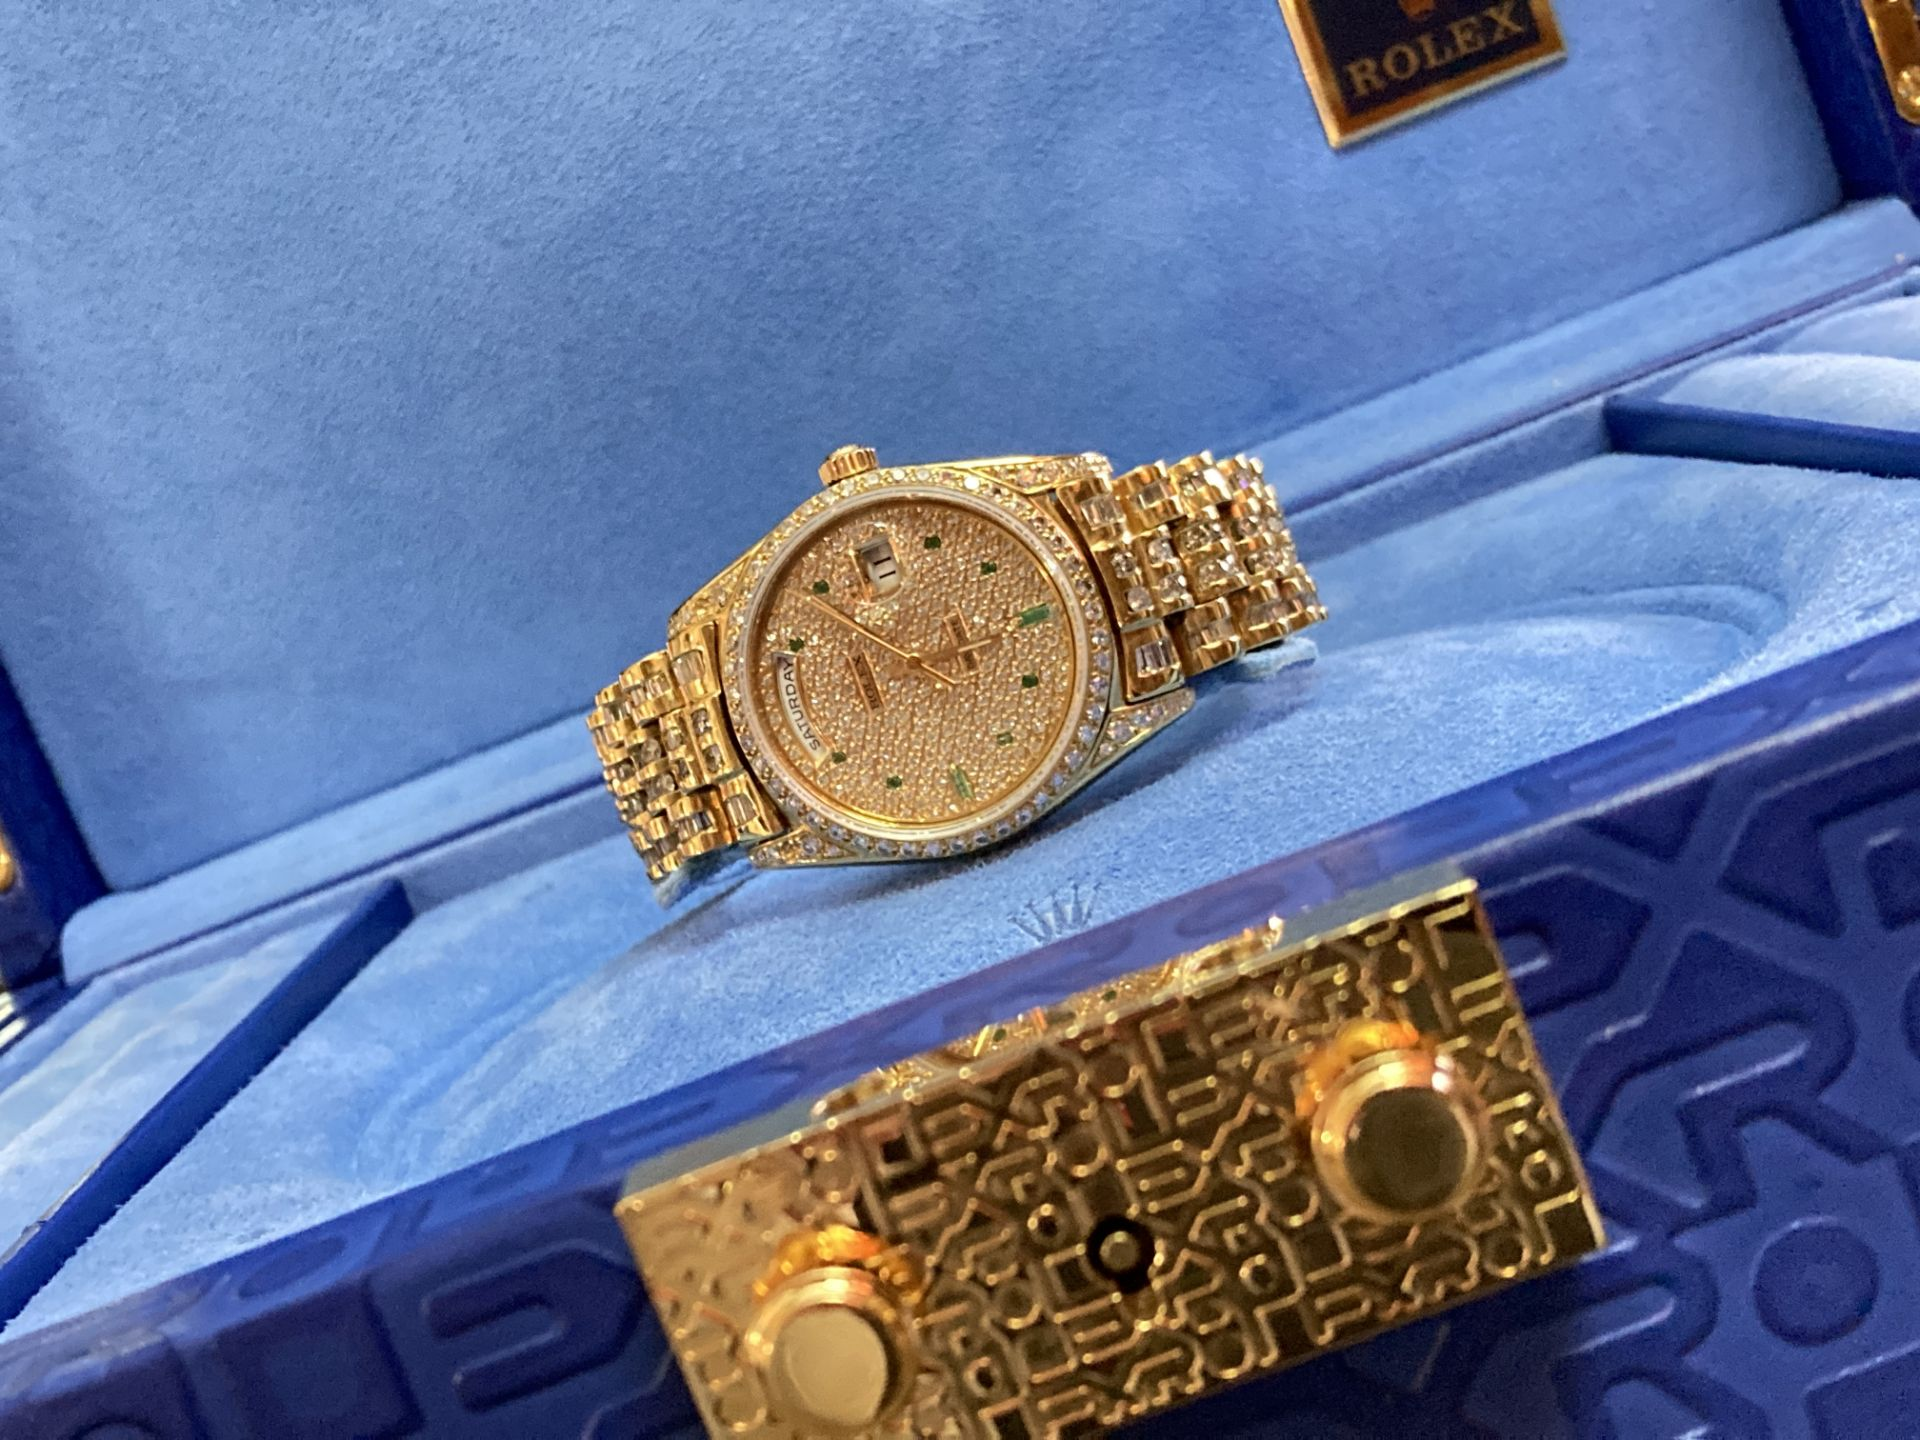 GENTS 36mm ROLEX DAYDATE YELLOW GOLD DIAMOND WATCH - Image 3 of 21